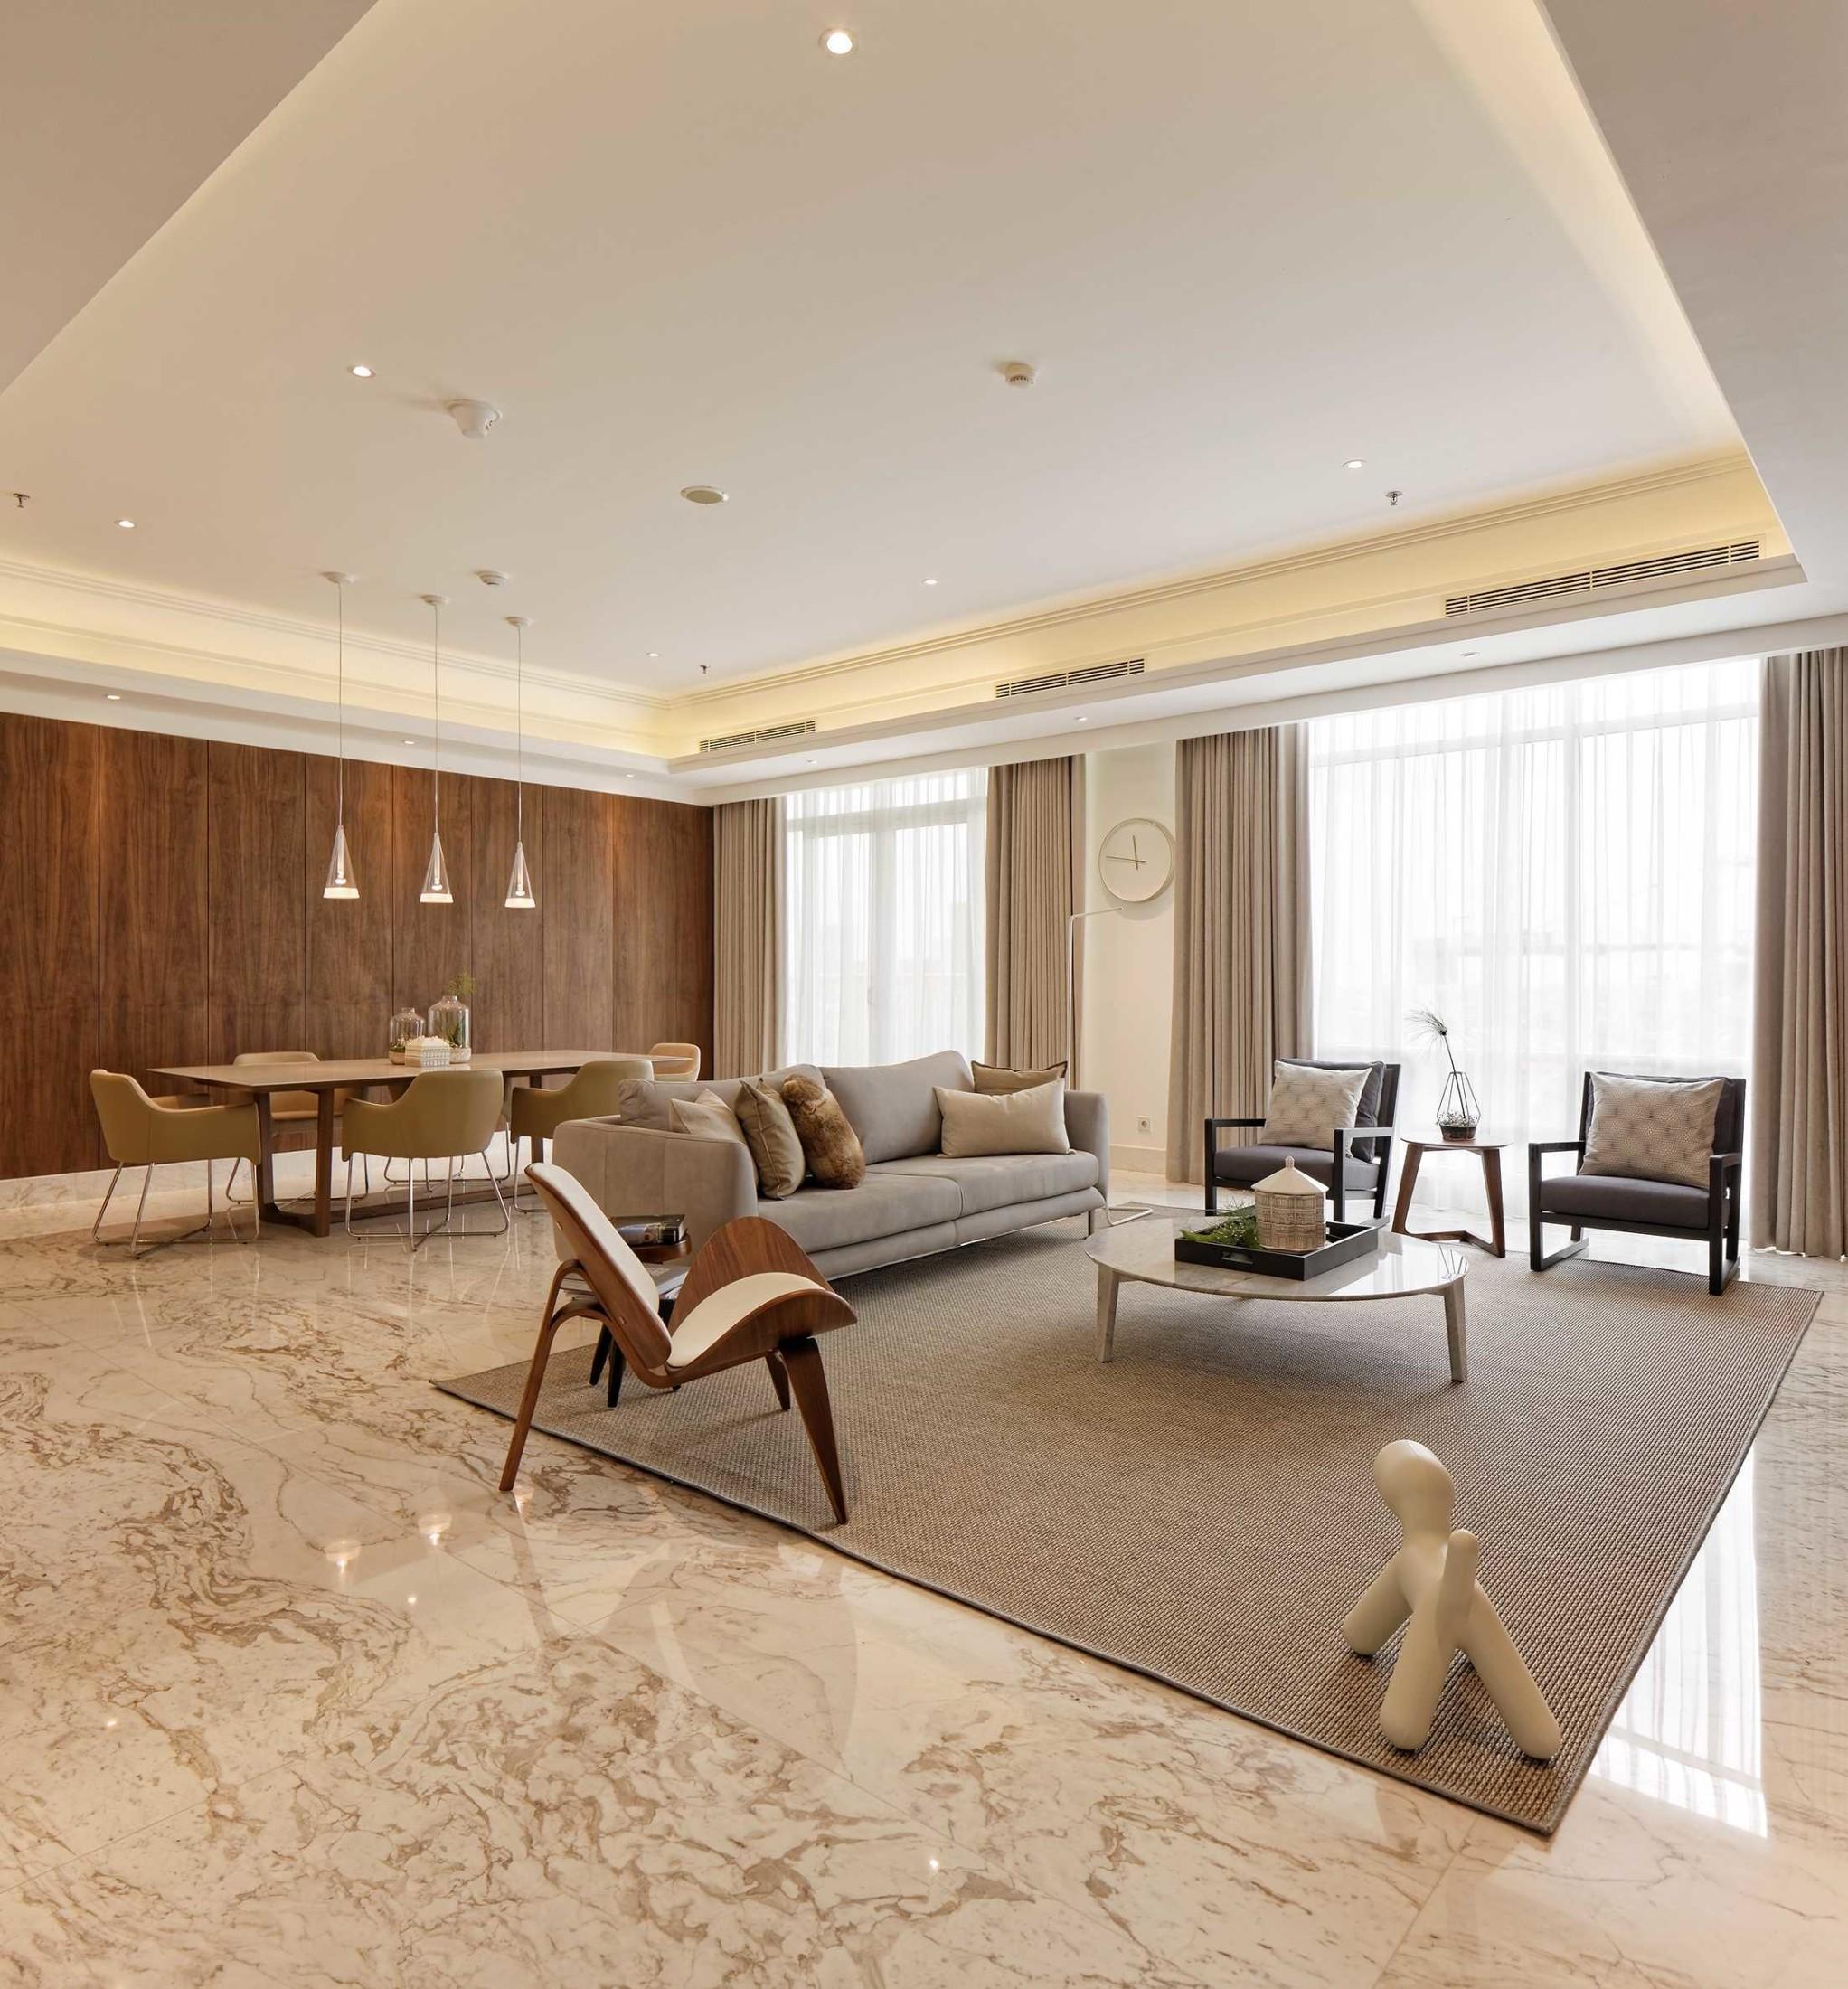 Kesan simpel didapat dari minimnya perabotan yang diikutsertakan dalam desain. Setiap elemen yang ada dalam ruang hanyalah yang benar-benar harus ada dan berfungsi optimal.